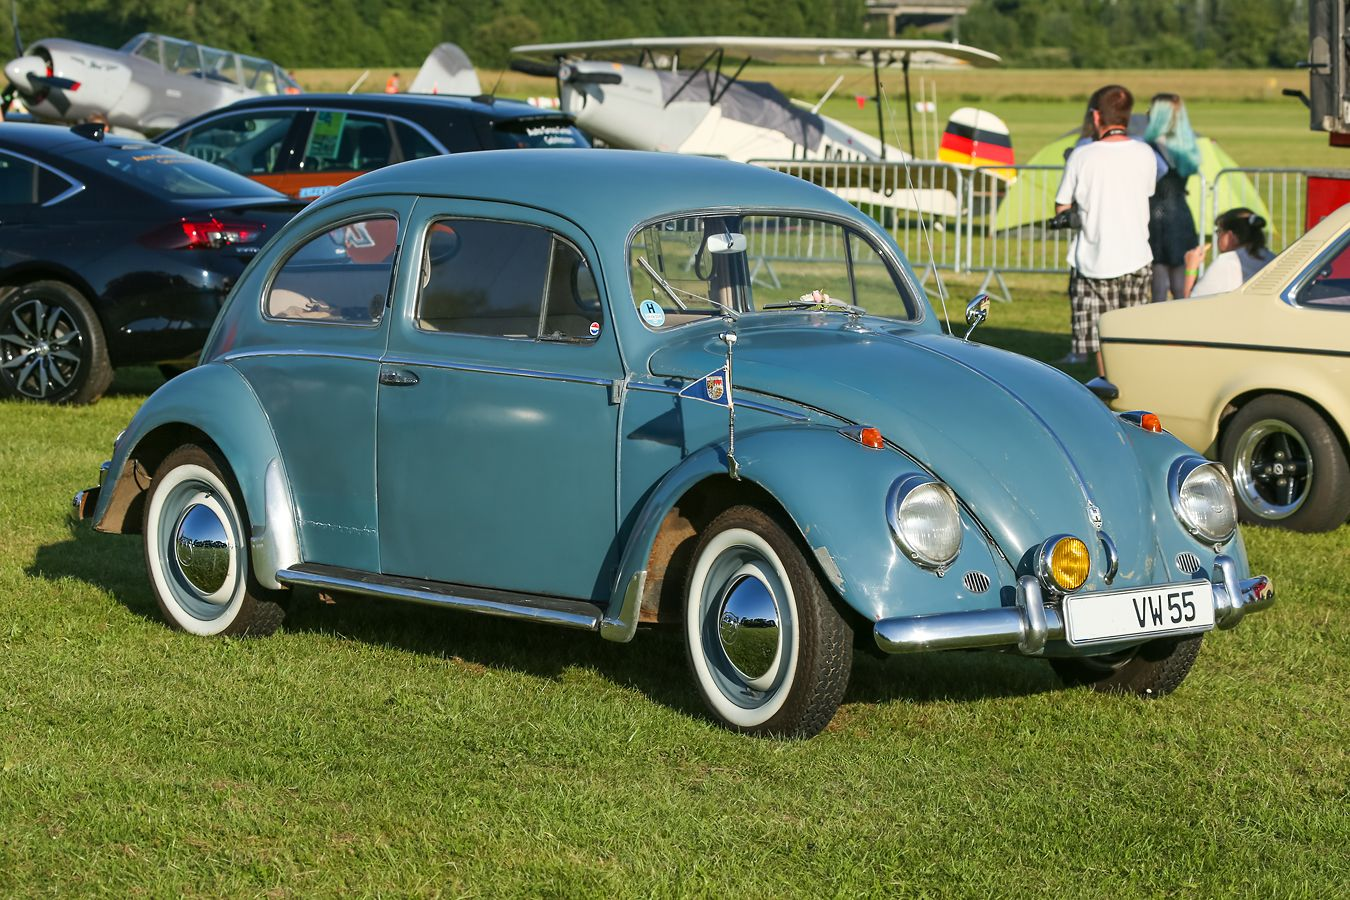 Жук. Автомобиль машина Фольксваген ретро Volkswagen oldtimer